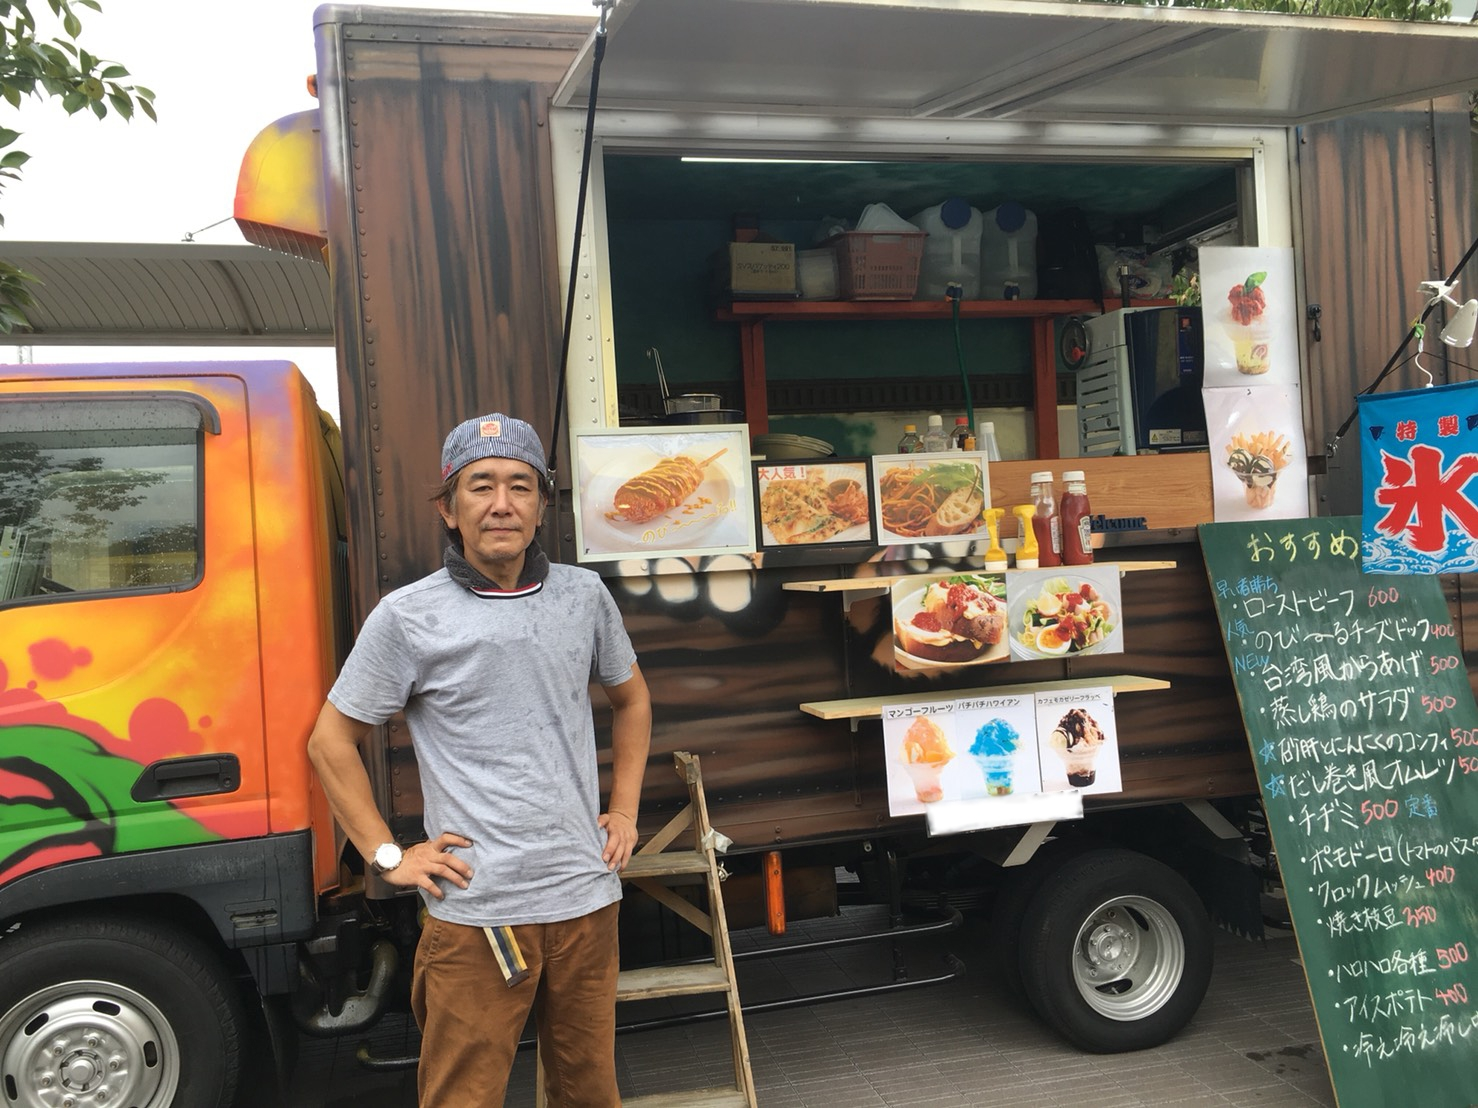 Deli di Compagne,ディリディコンパ―ニョ,キッチンカー,フードトラック,出店,愛知,岐阜,チーズドッグ,ローストビーフ丼